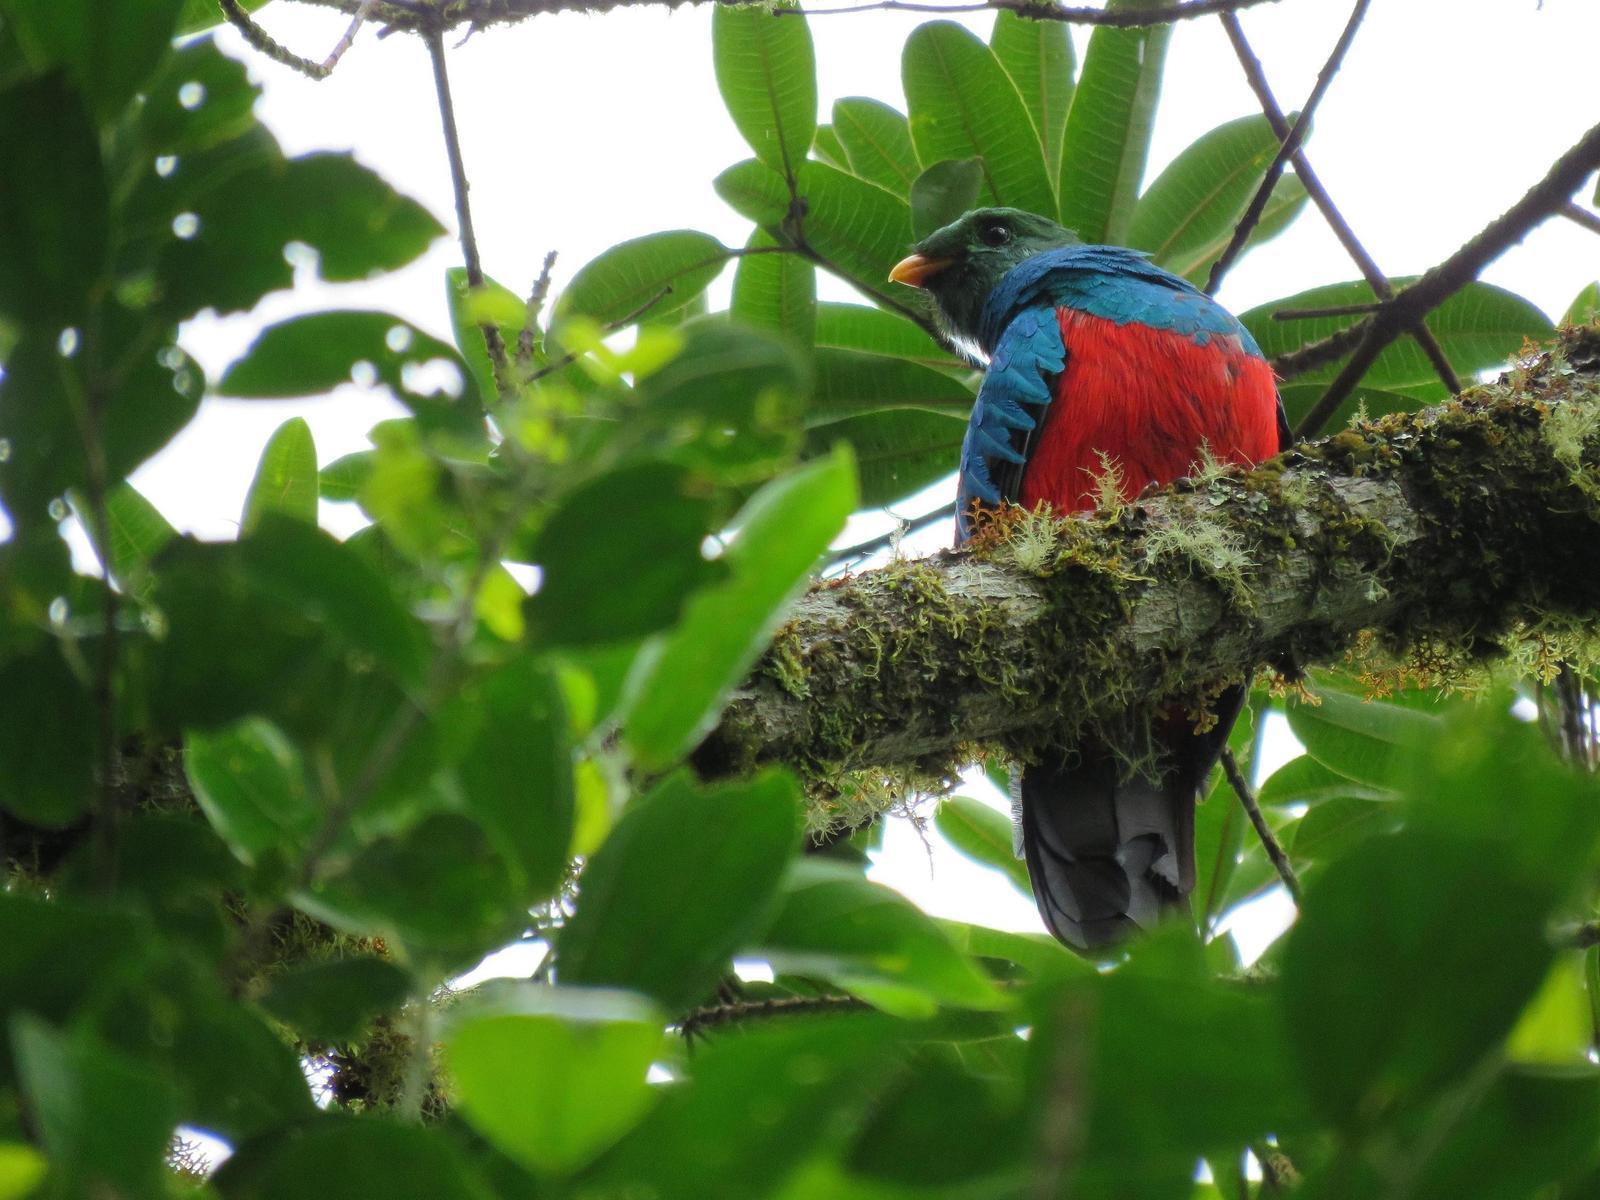 Golden-headed Quetzal Photo by Mauricio Zanoletti